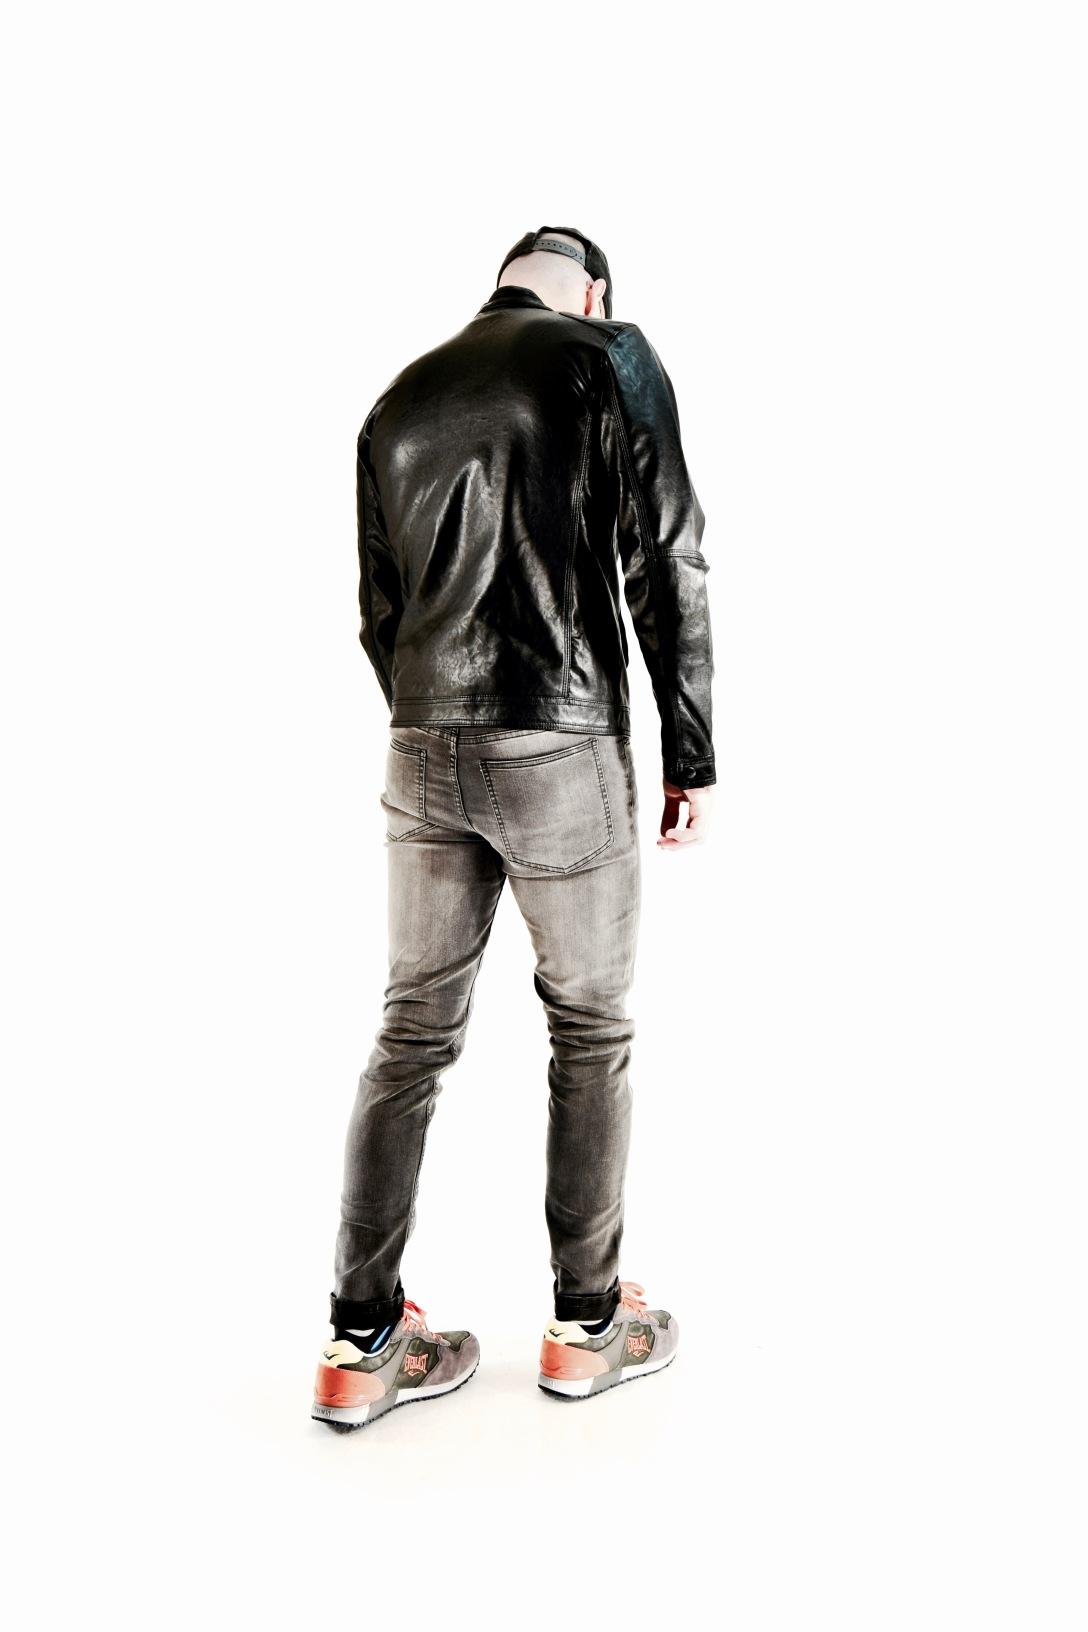 cheap mondays, skinny jeans, sneakers, roman, fashionblogger, styleblogger, back, jacket, hat,